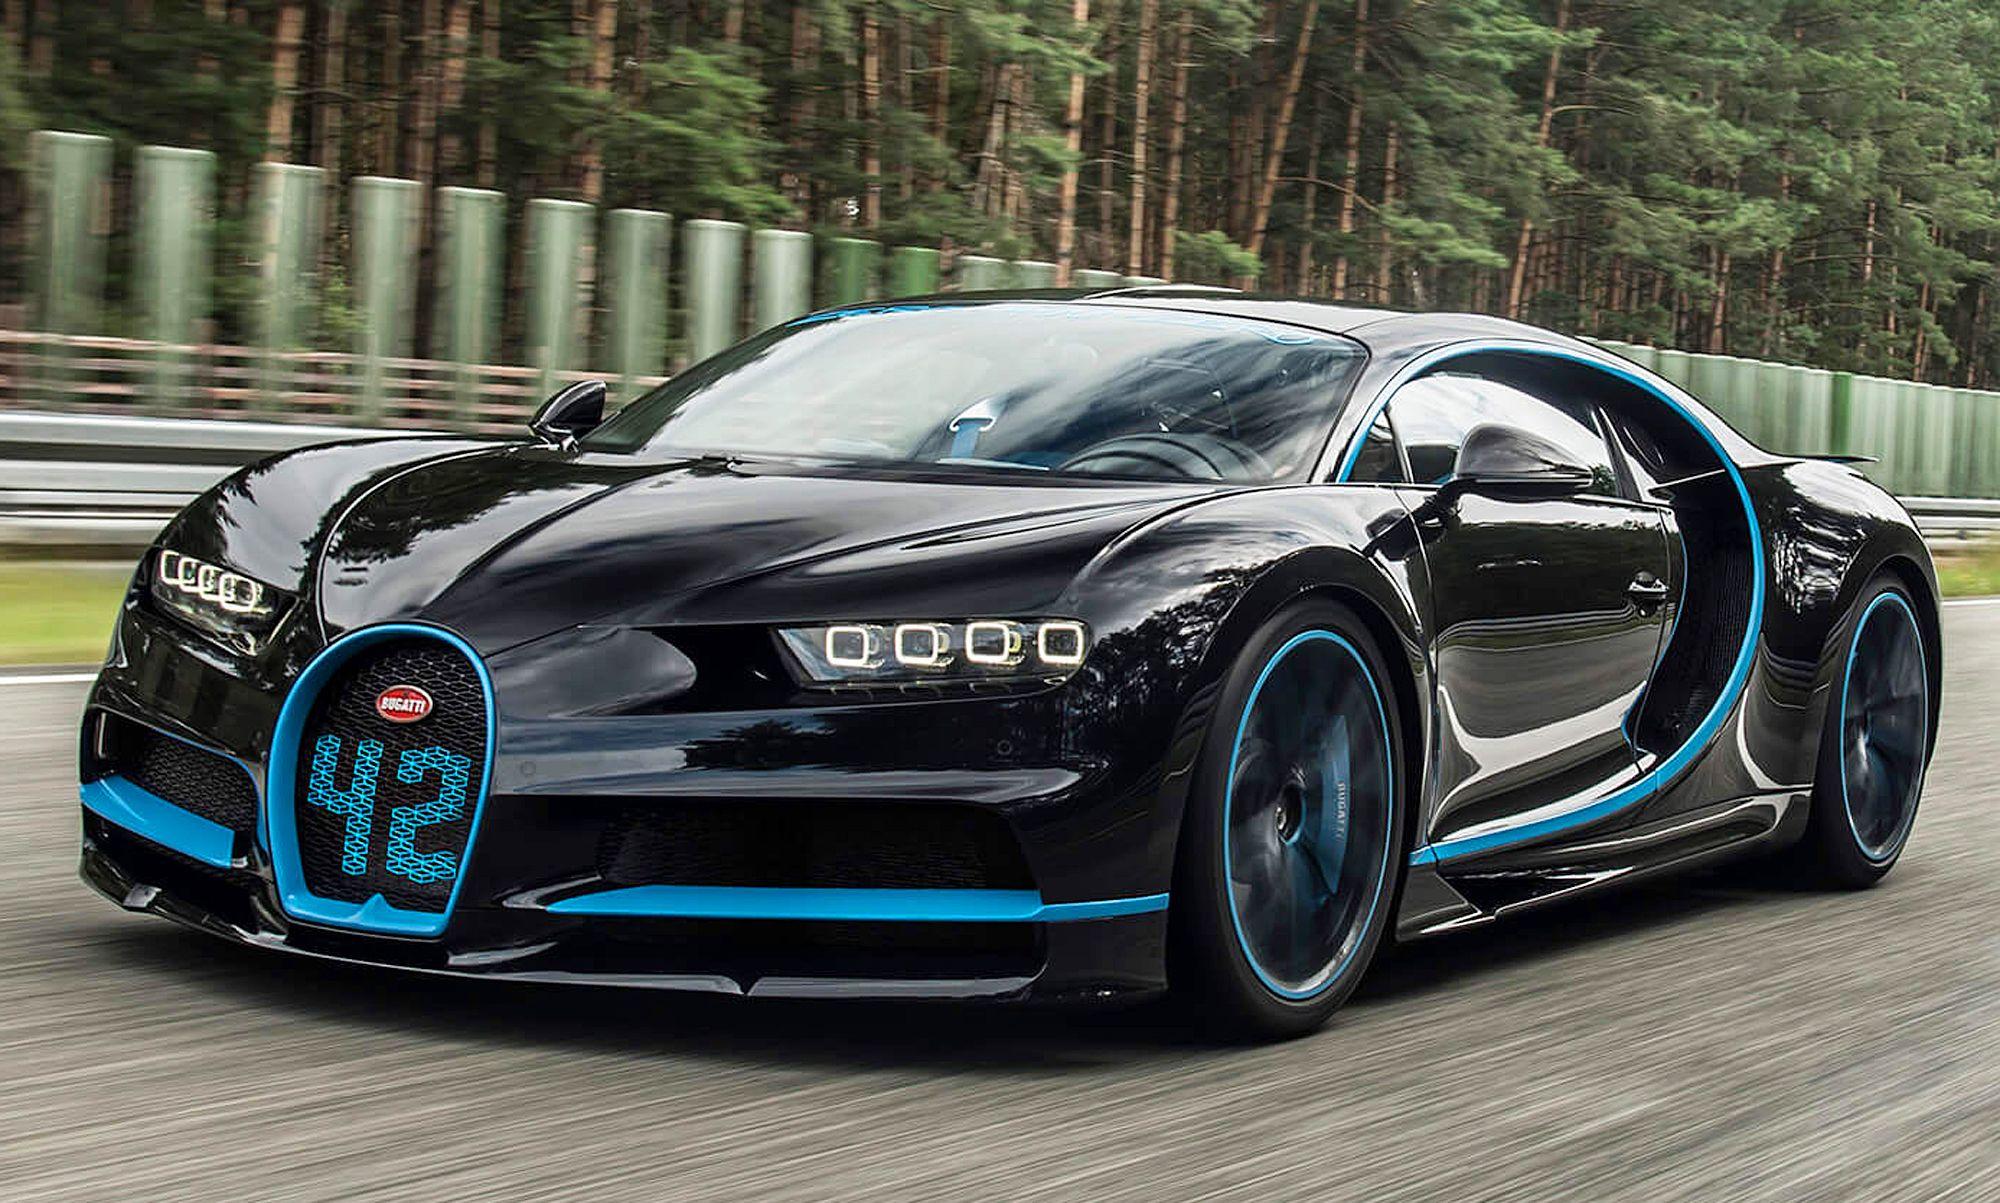 2b8026932ce048ddd1c58c4a04504a96 Extraordinary Bugatti Veyron Price List Philippines Cars Trend